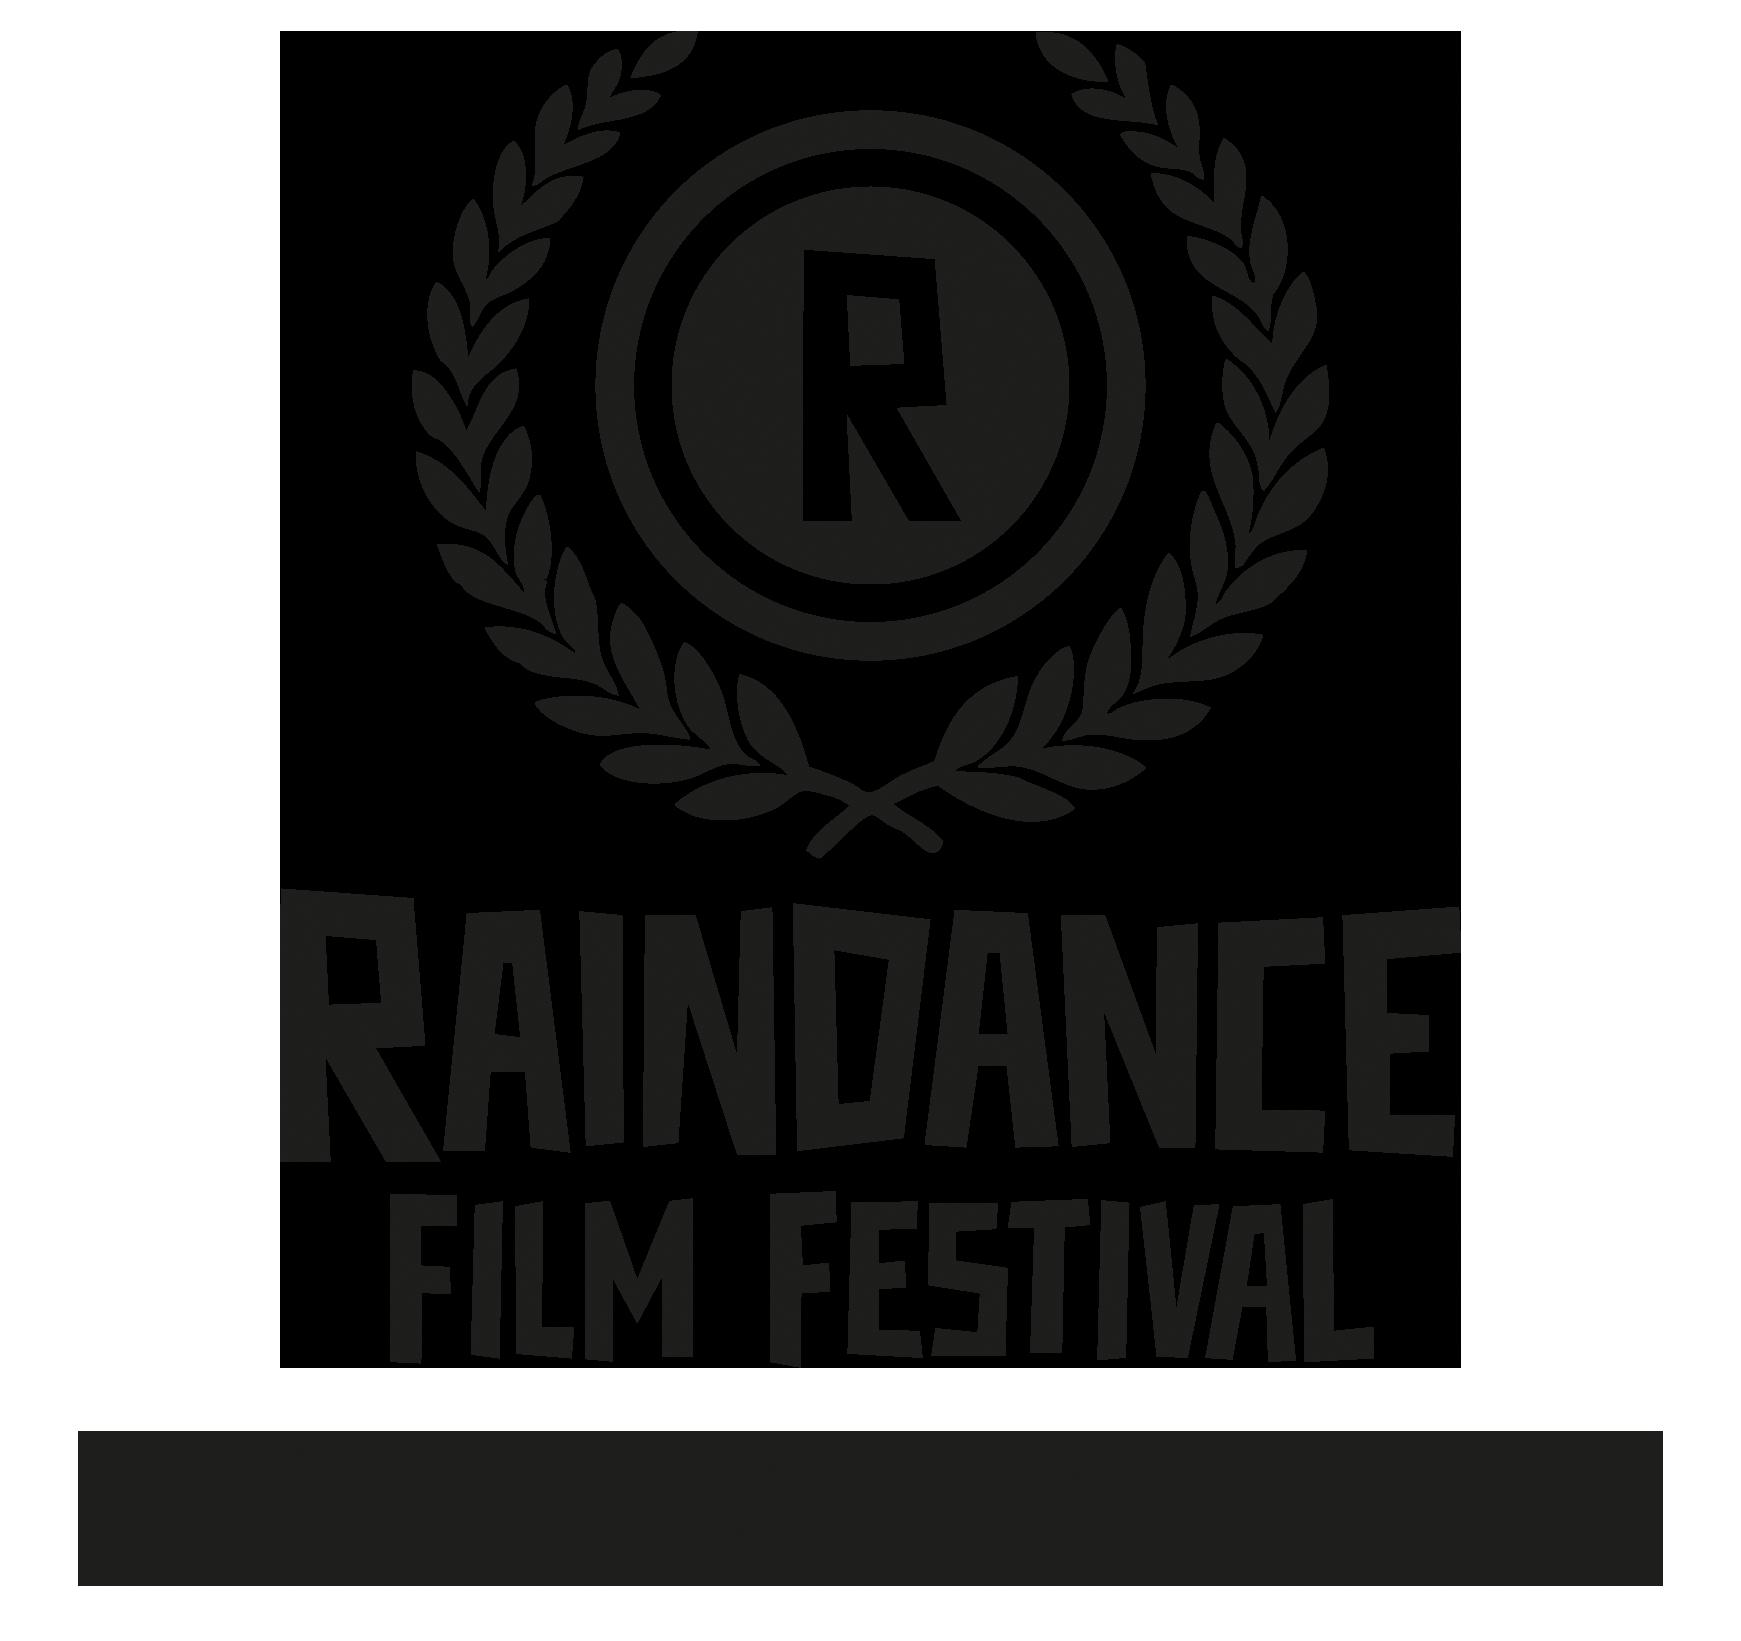 23RFF_FilmFestival_OfficialSelection.png